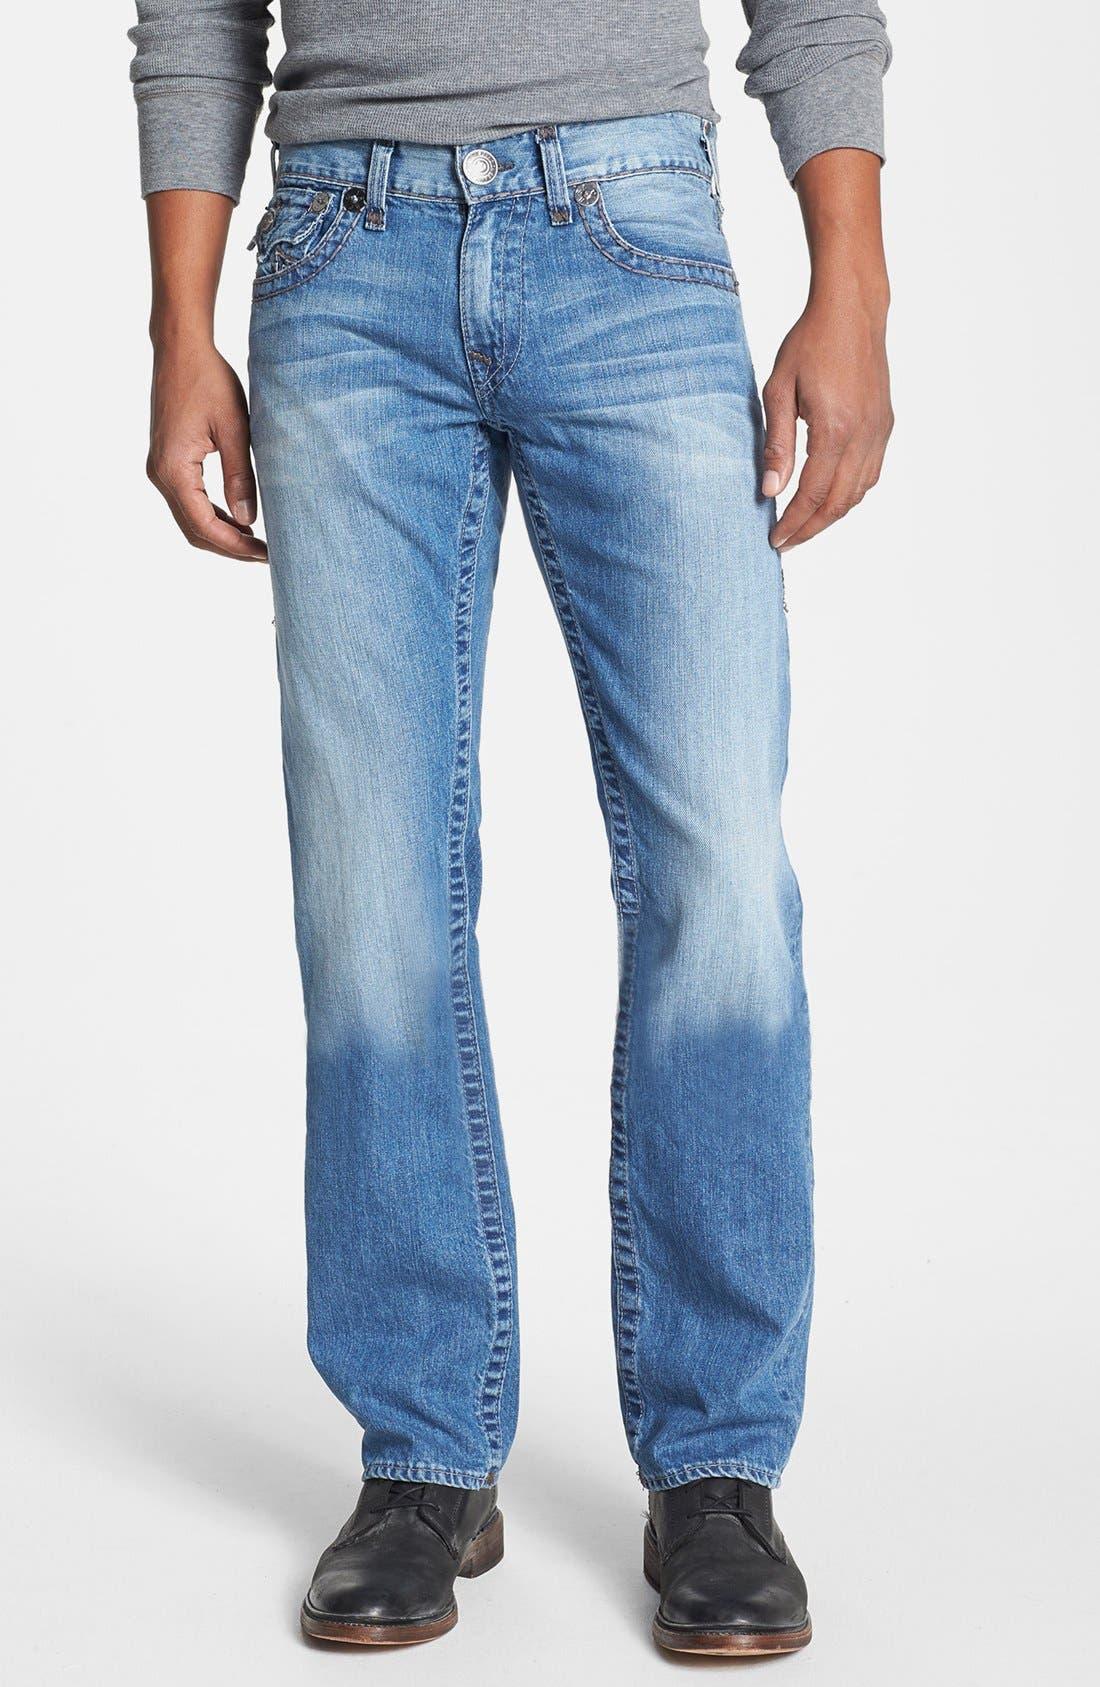 'Ricky' Straight Leg Jeans,                             Alternate thumbnail 2, color,                             400